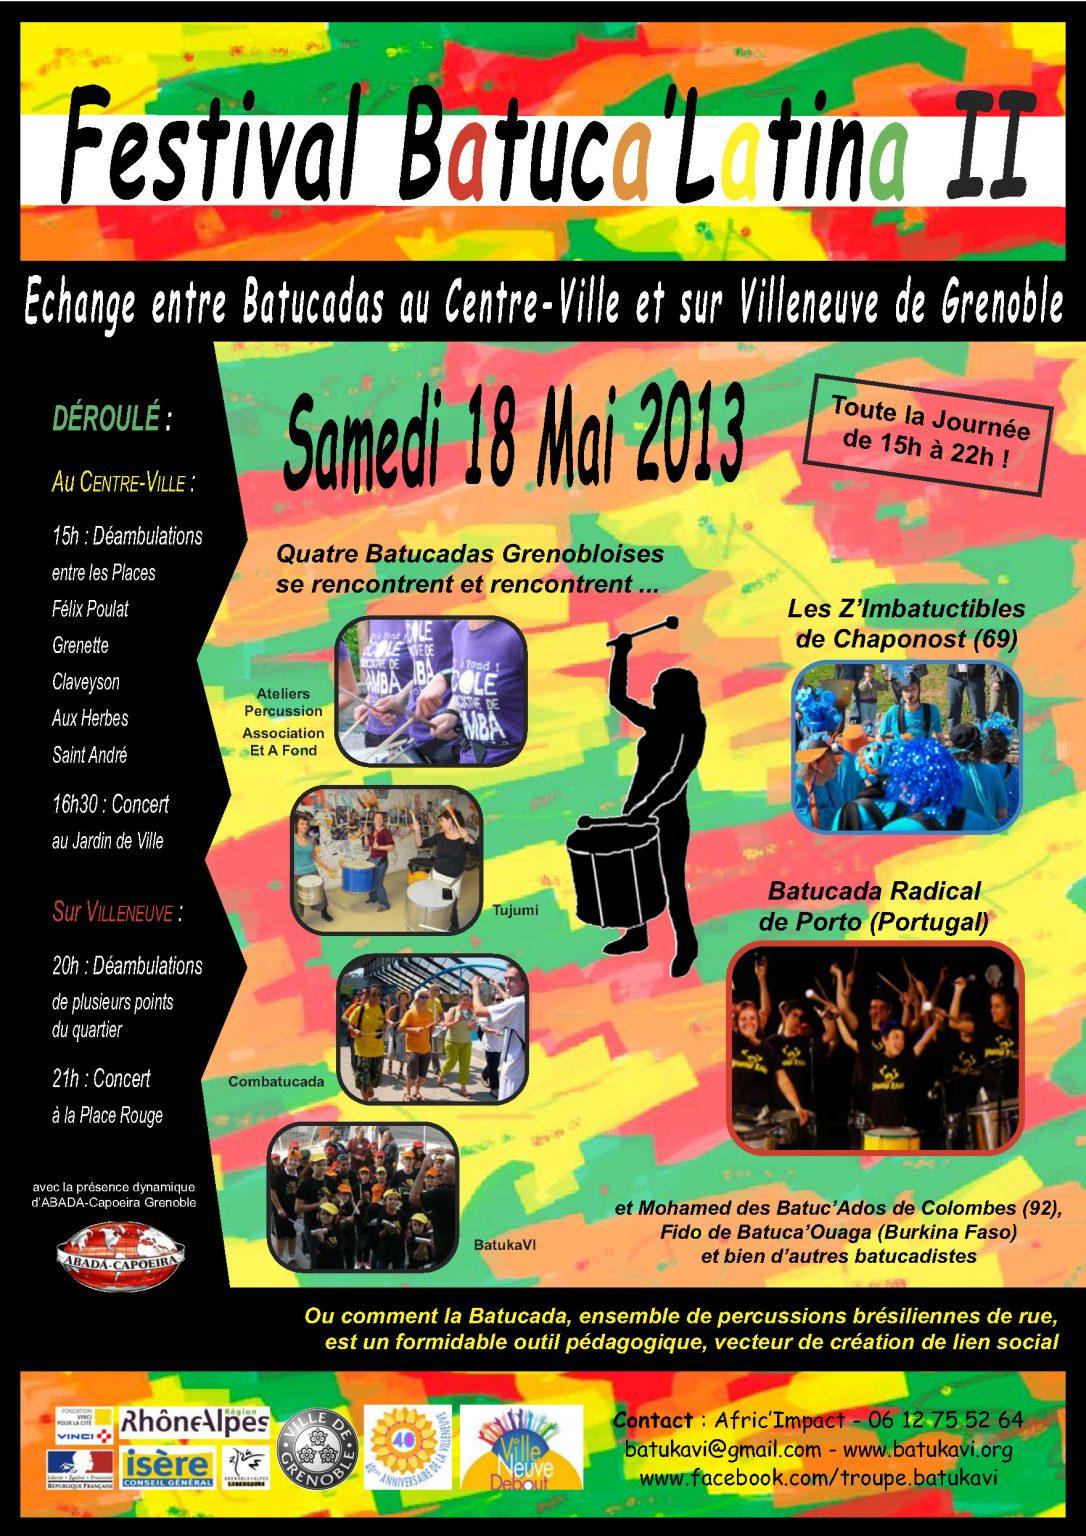 2013-05 Festival Batuca'Latina II